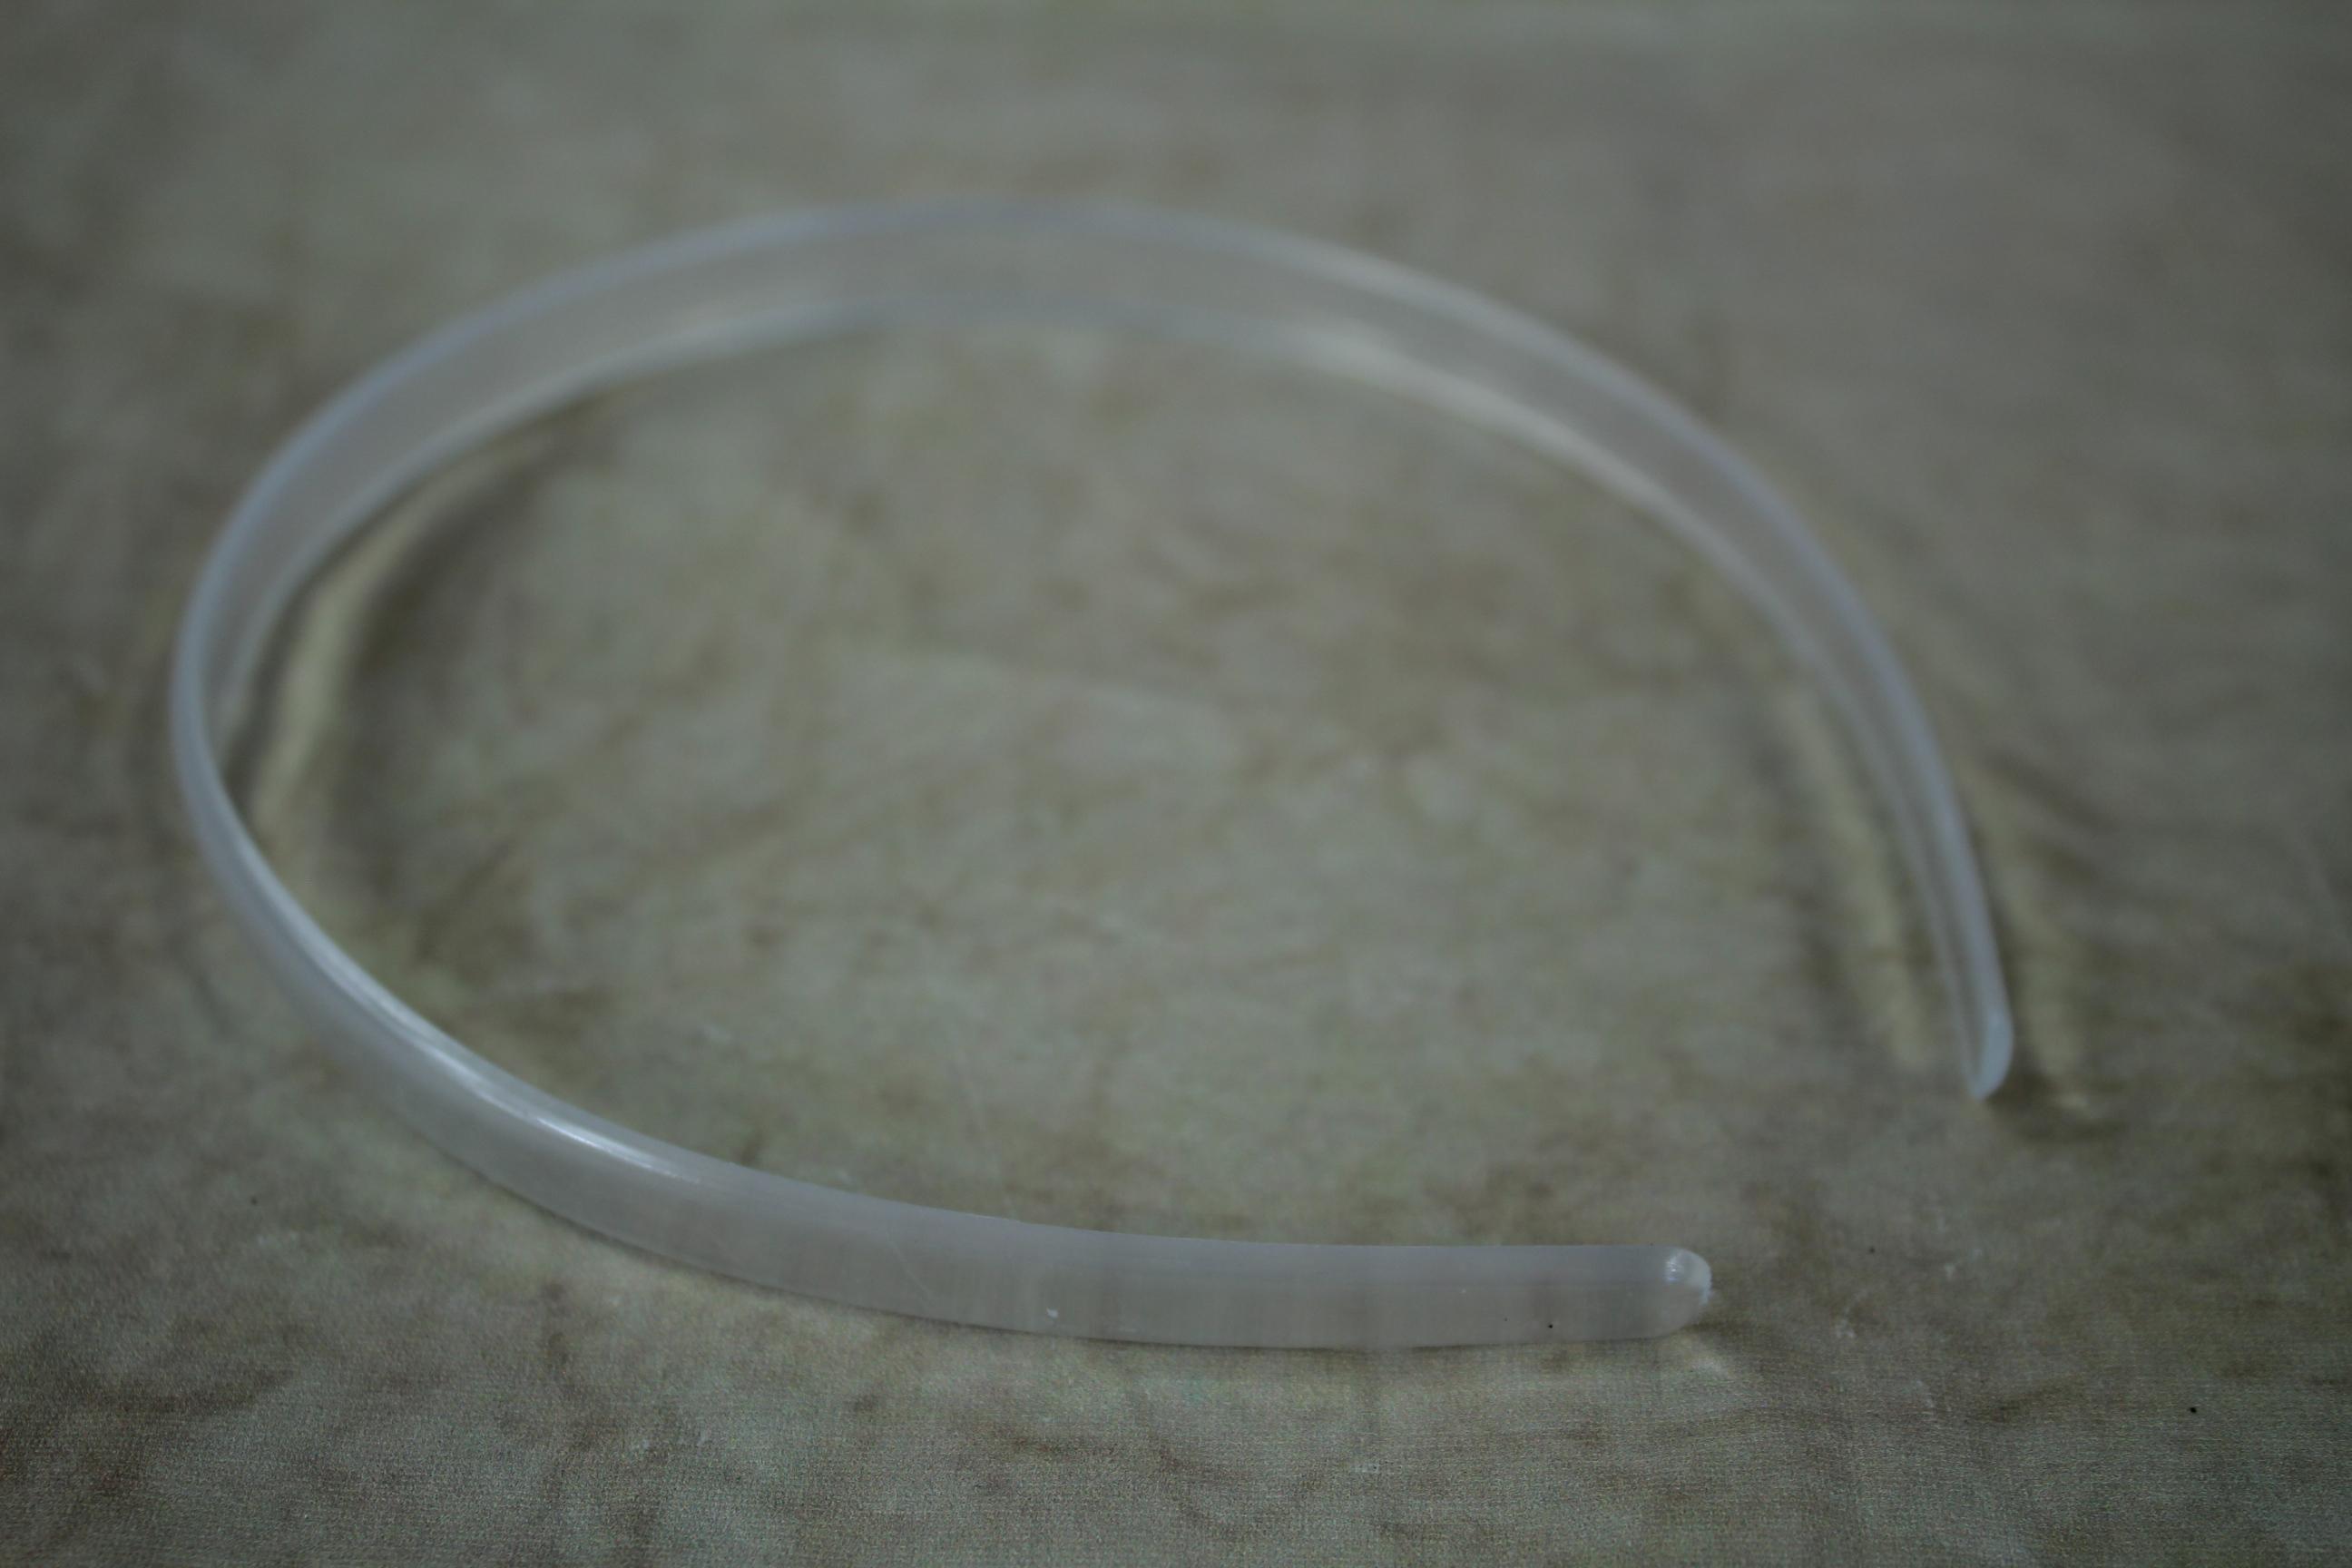 20 x 10mm plastic headbands